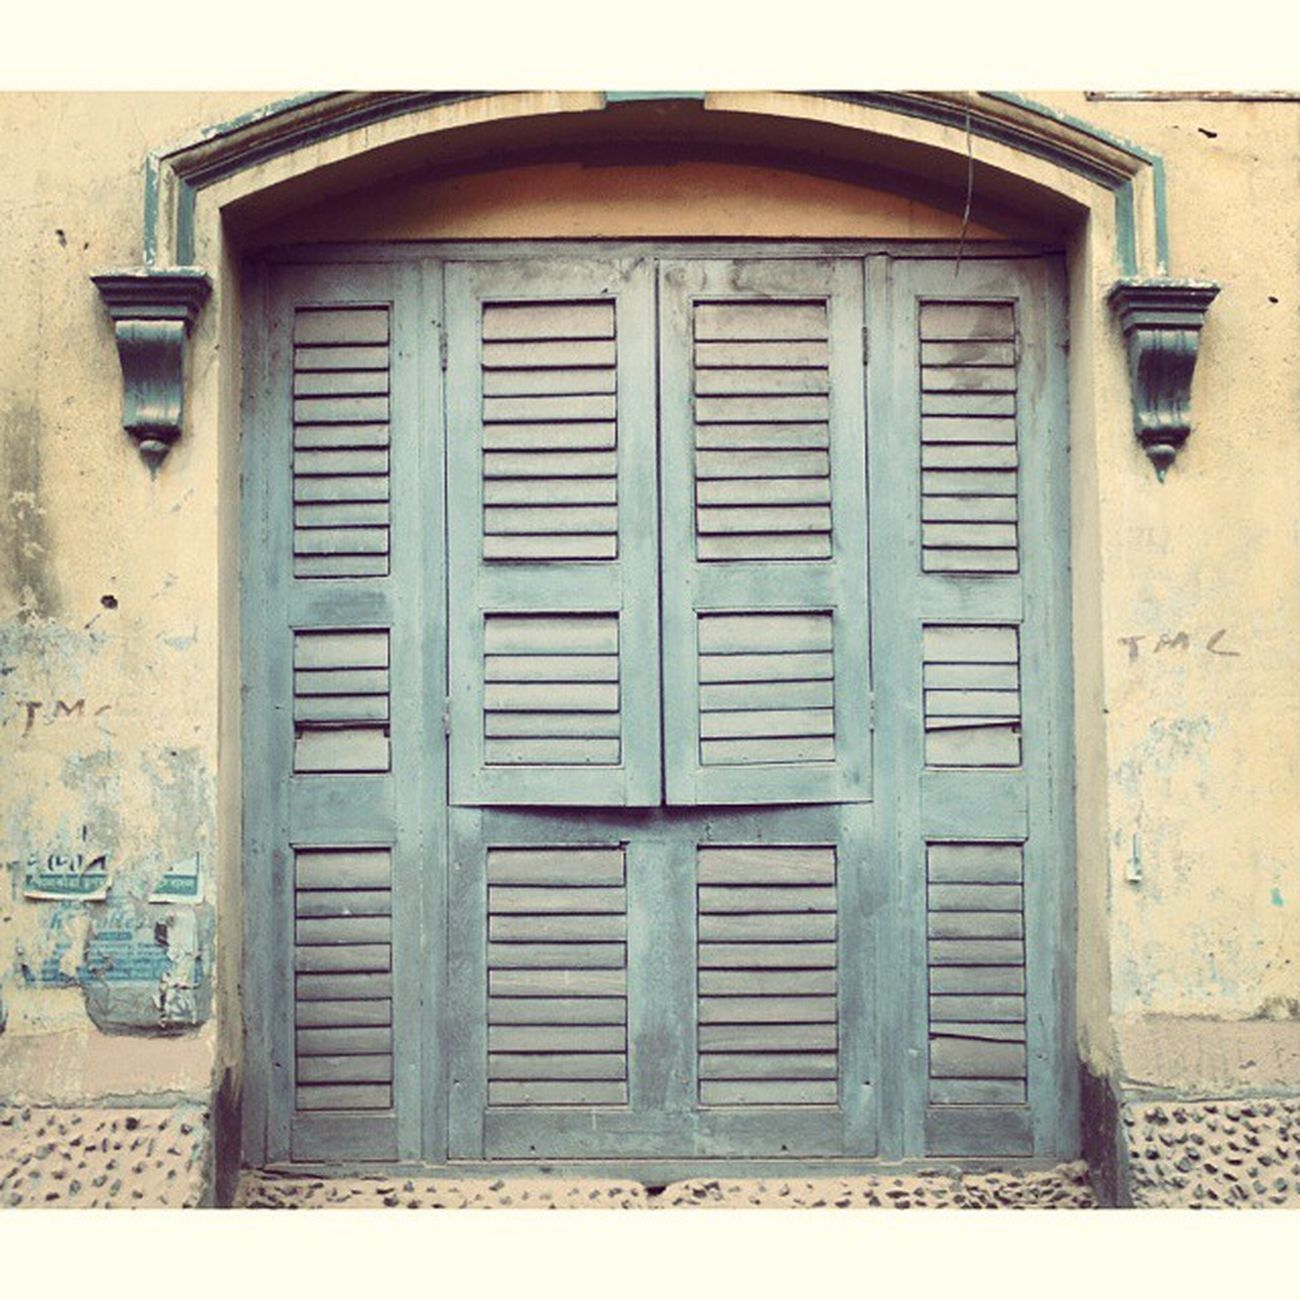 Time for some windows..shot during KolkataInstameet Theme Doors, locks and Windows of Calcutta. Wwim11 Wwimkol11 Kolinstameet Windows Symmetry Calcuttacacophony Calcuttalanes Streetphotogrphy Streetsofkolkata _soi Whywealllovecalcutta India_gram Igramming_india Oyeitsindia Instagram